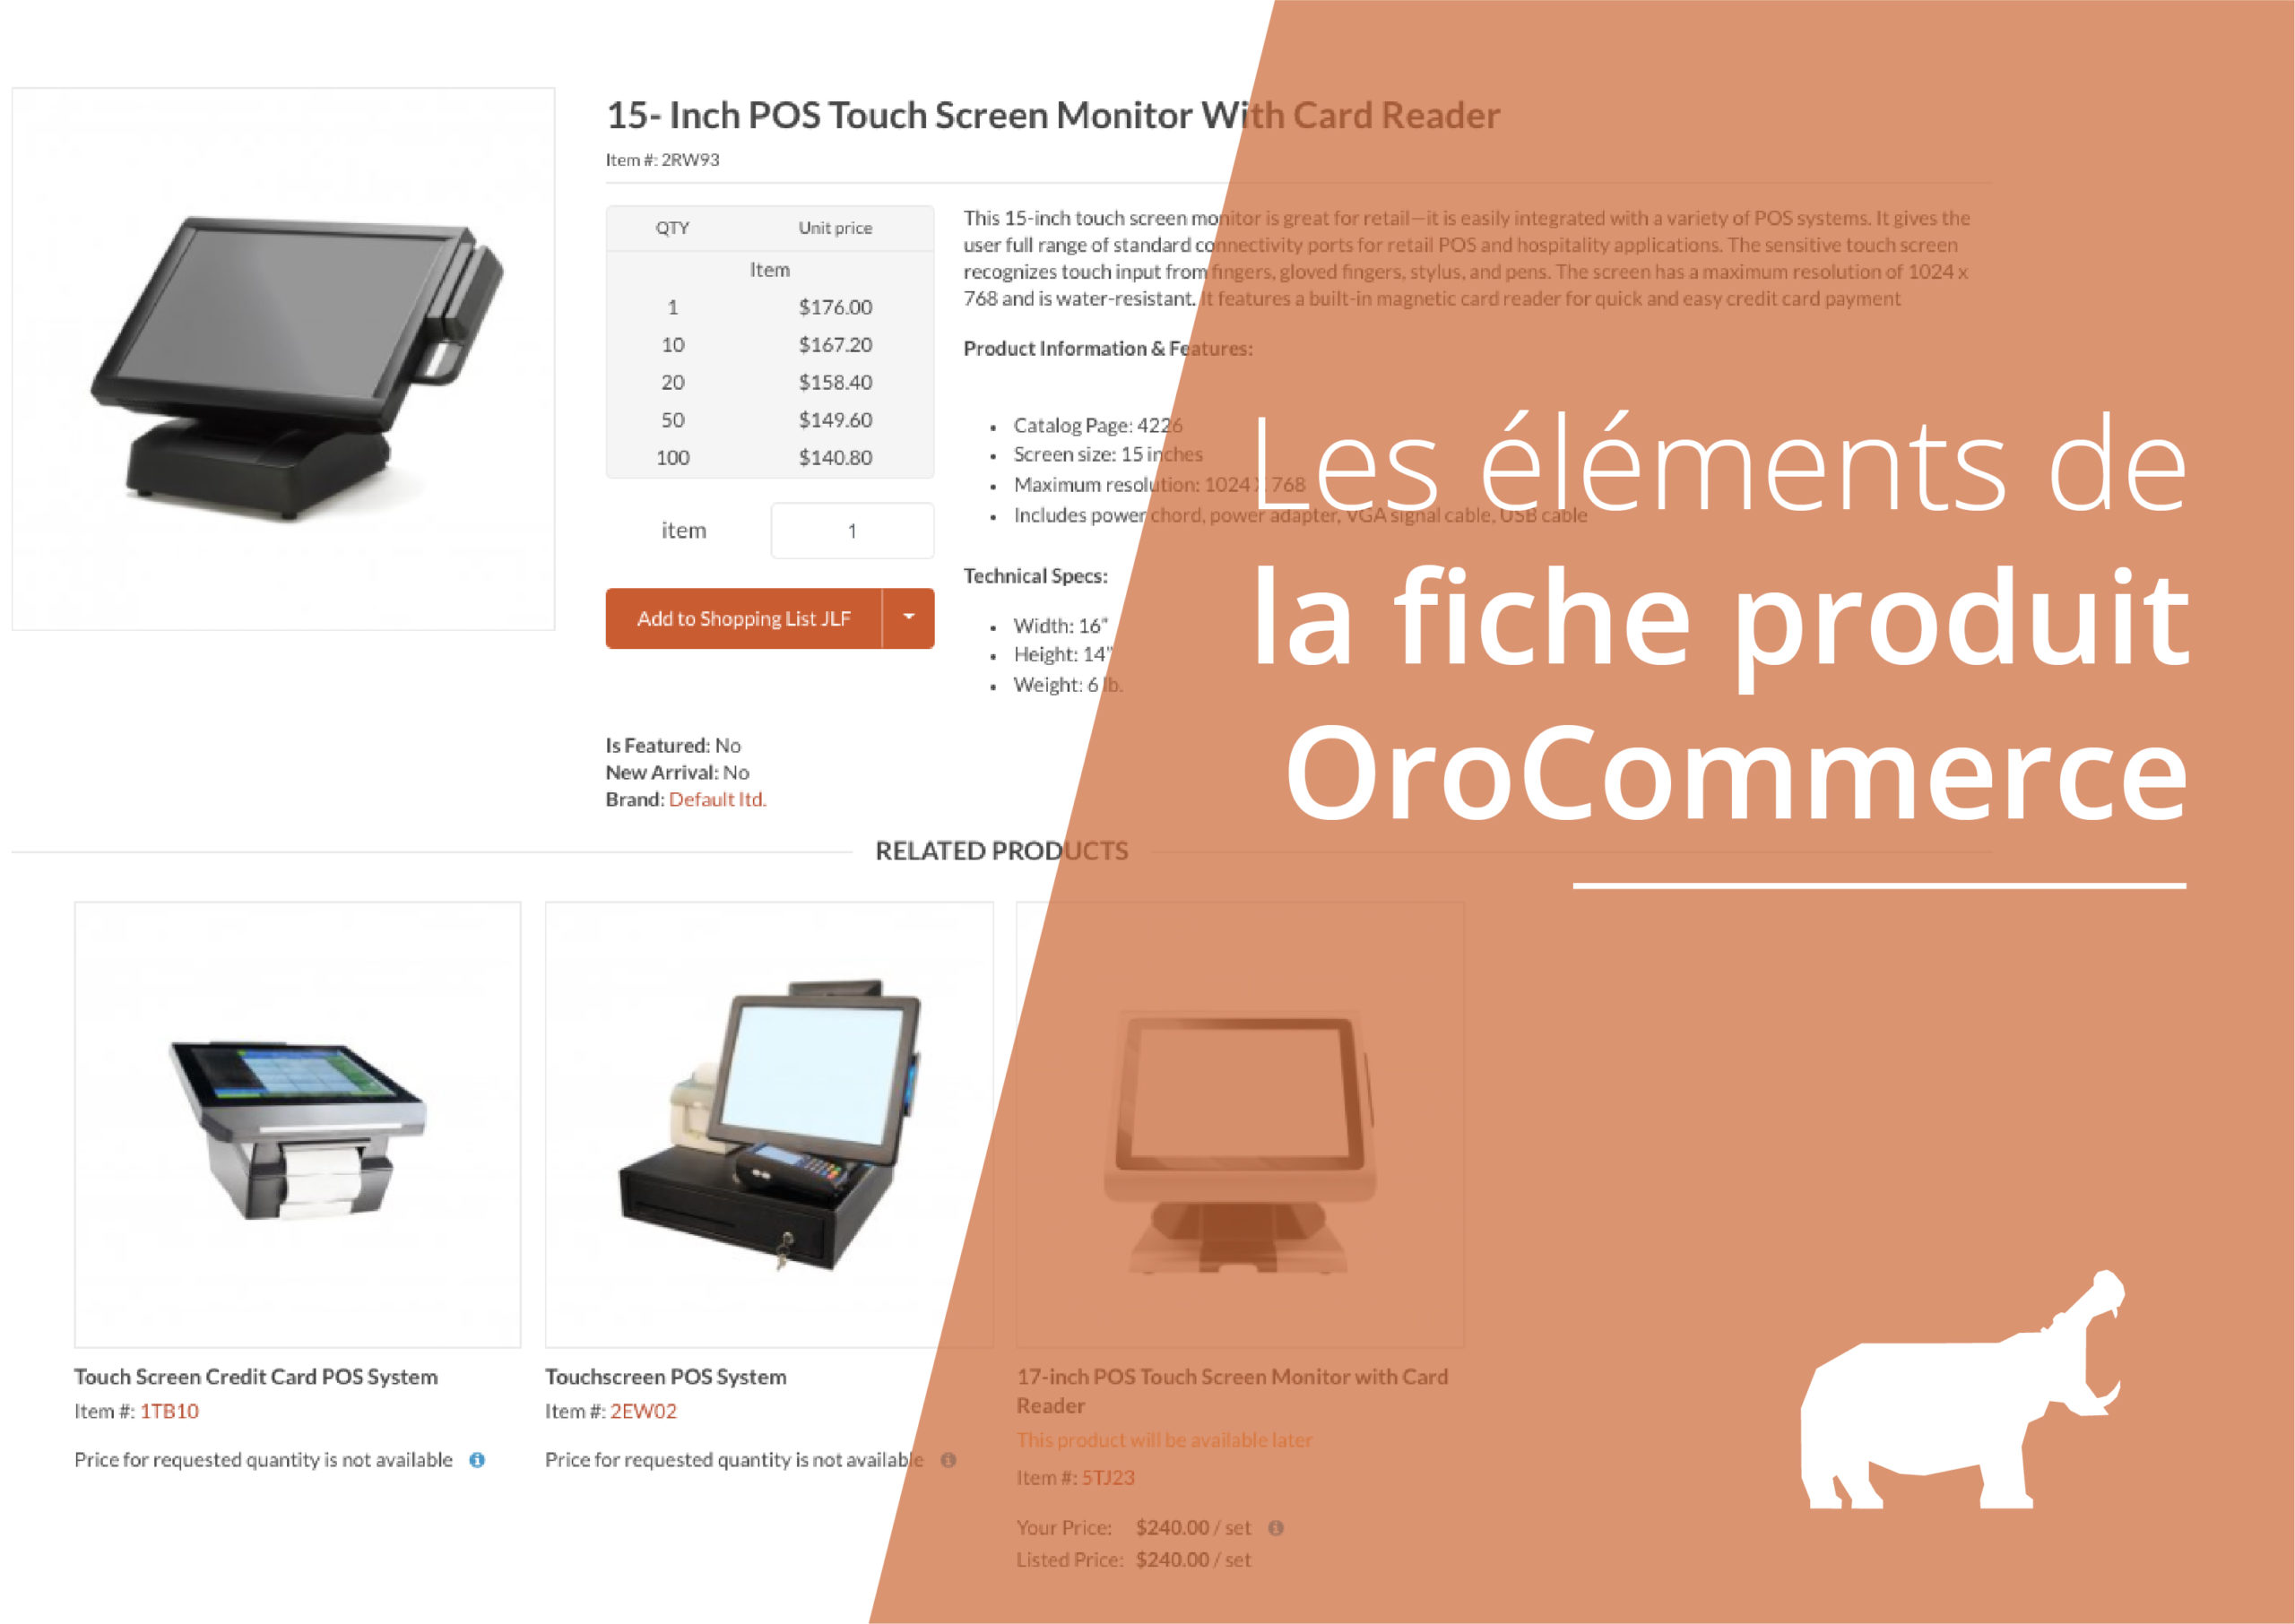 fiche produit OroCommerce